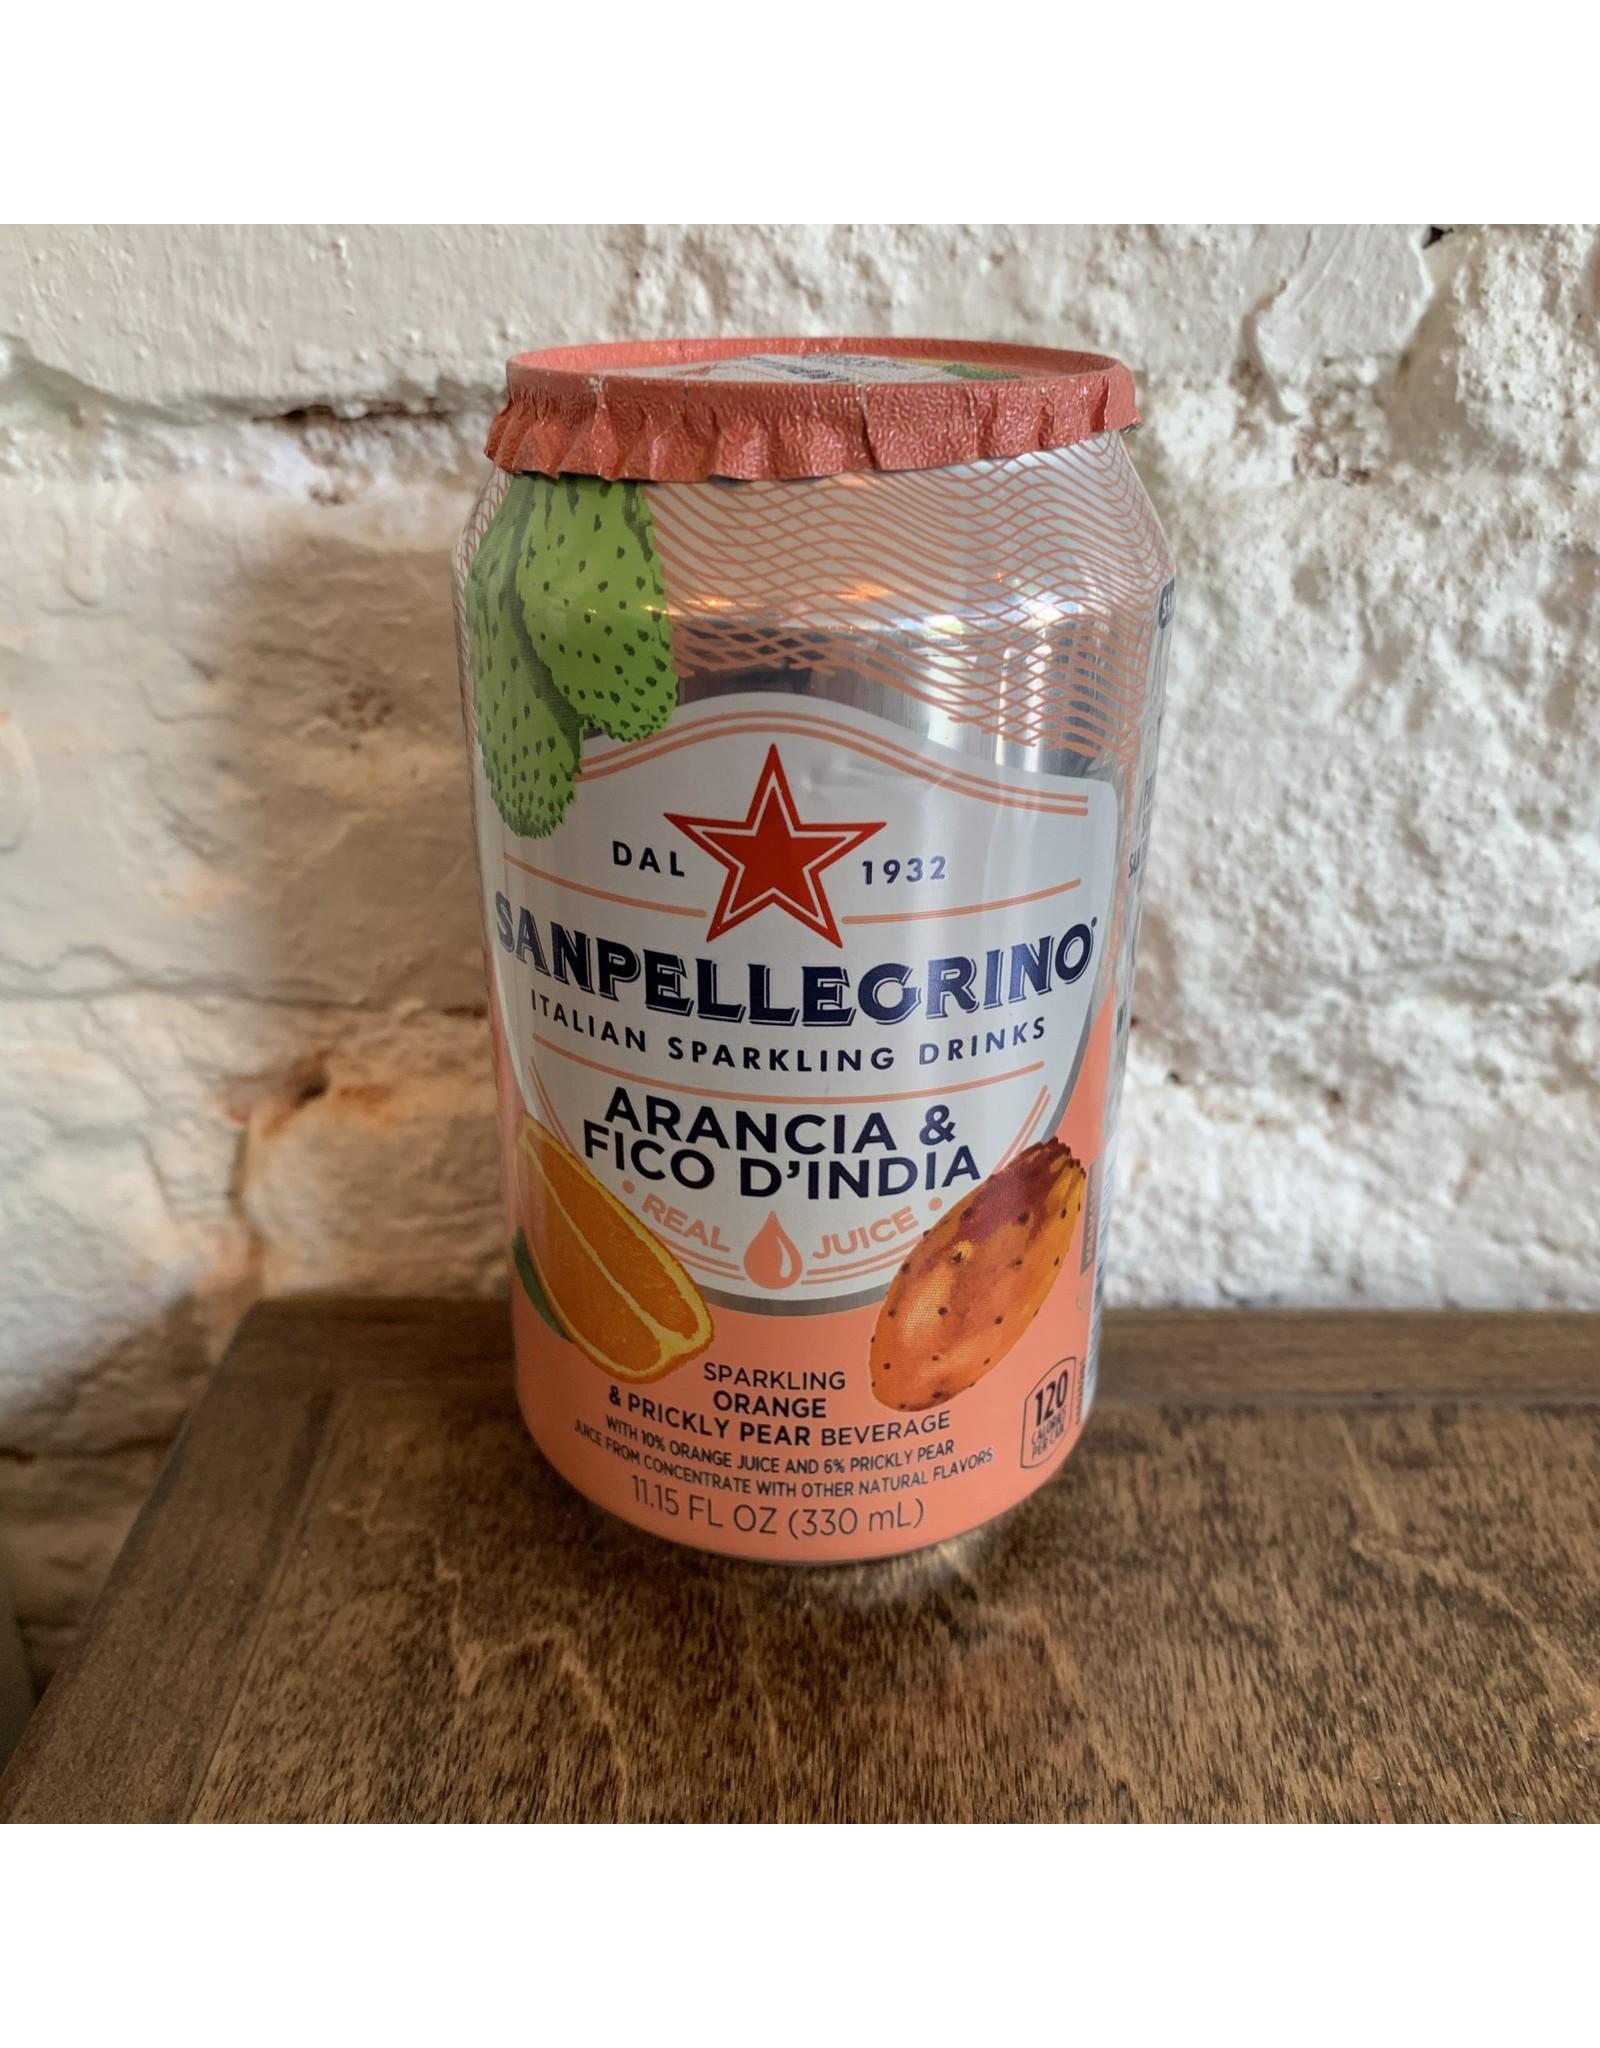 SanPellegrino SanPellegrino Soda, Orange & Prickly Pear